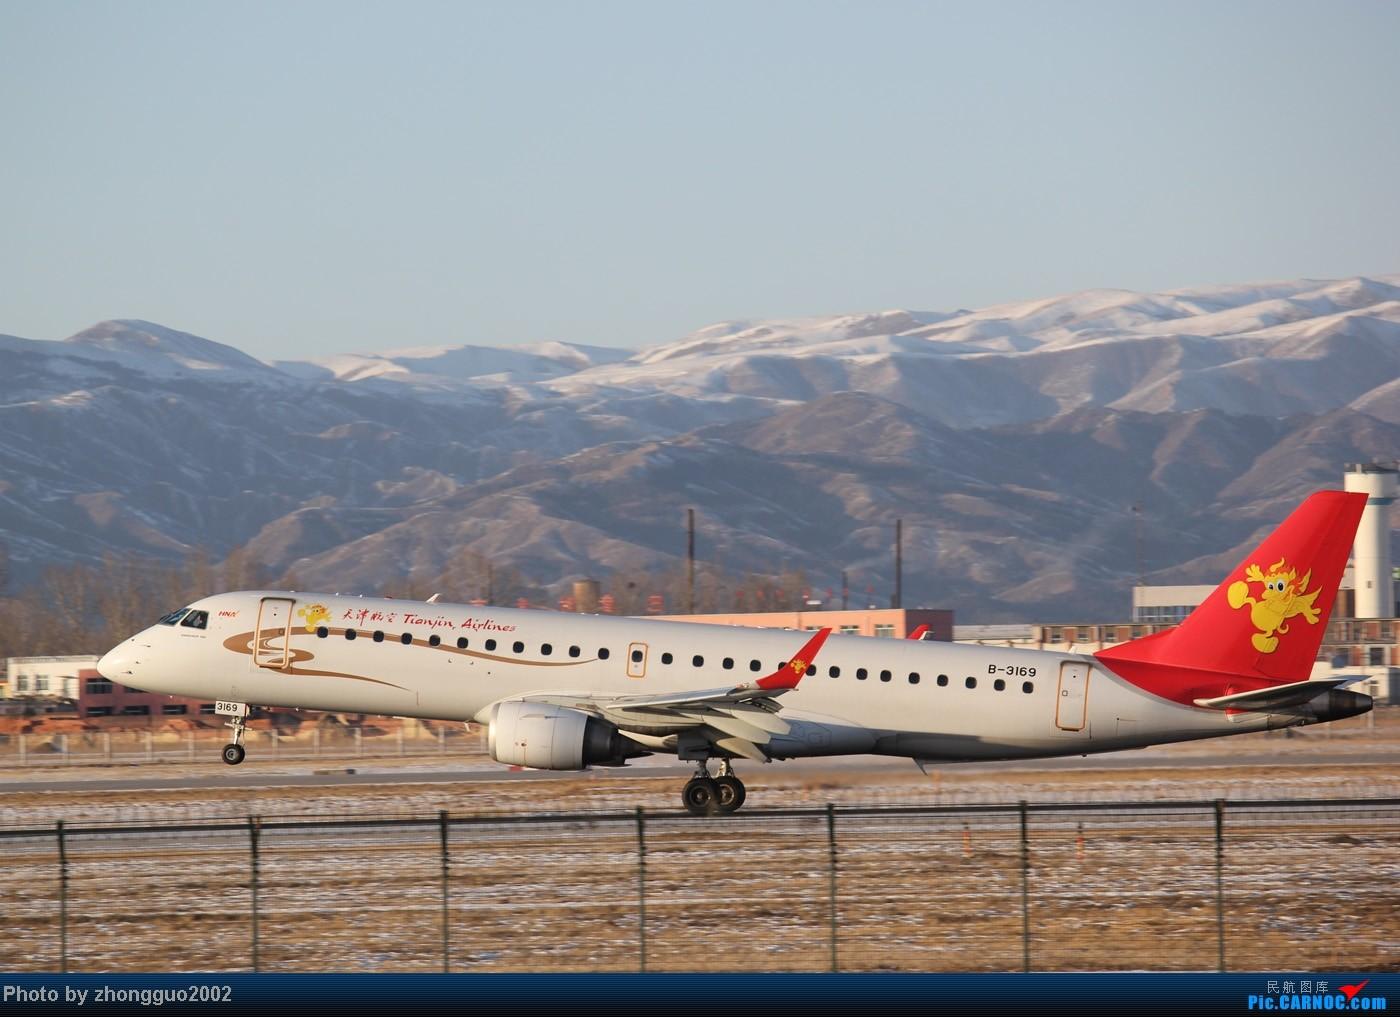 Re:[原创]随着2012年的最后一场雪的到了,我的2012年拍机工作也圆满的结束了,把这段时间里灰机整理一下,把没发的,我个人认为好的发上来! ERJ-190 B-3169 中国呼和浩特白塔国际机场